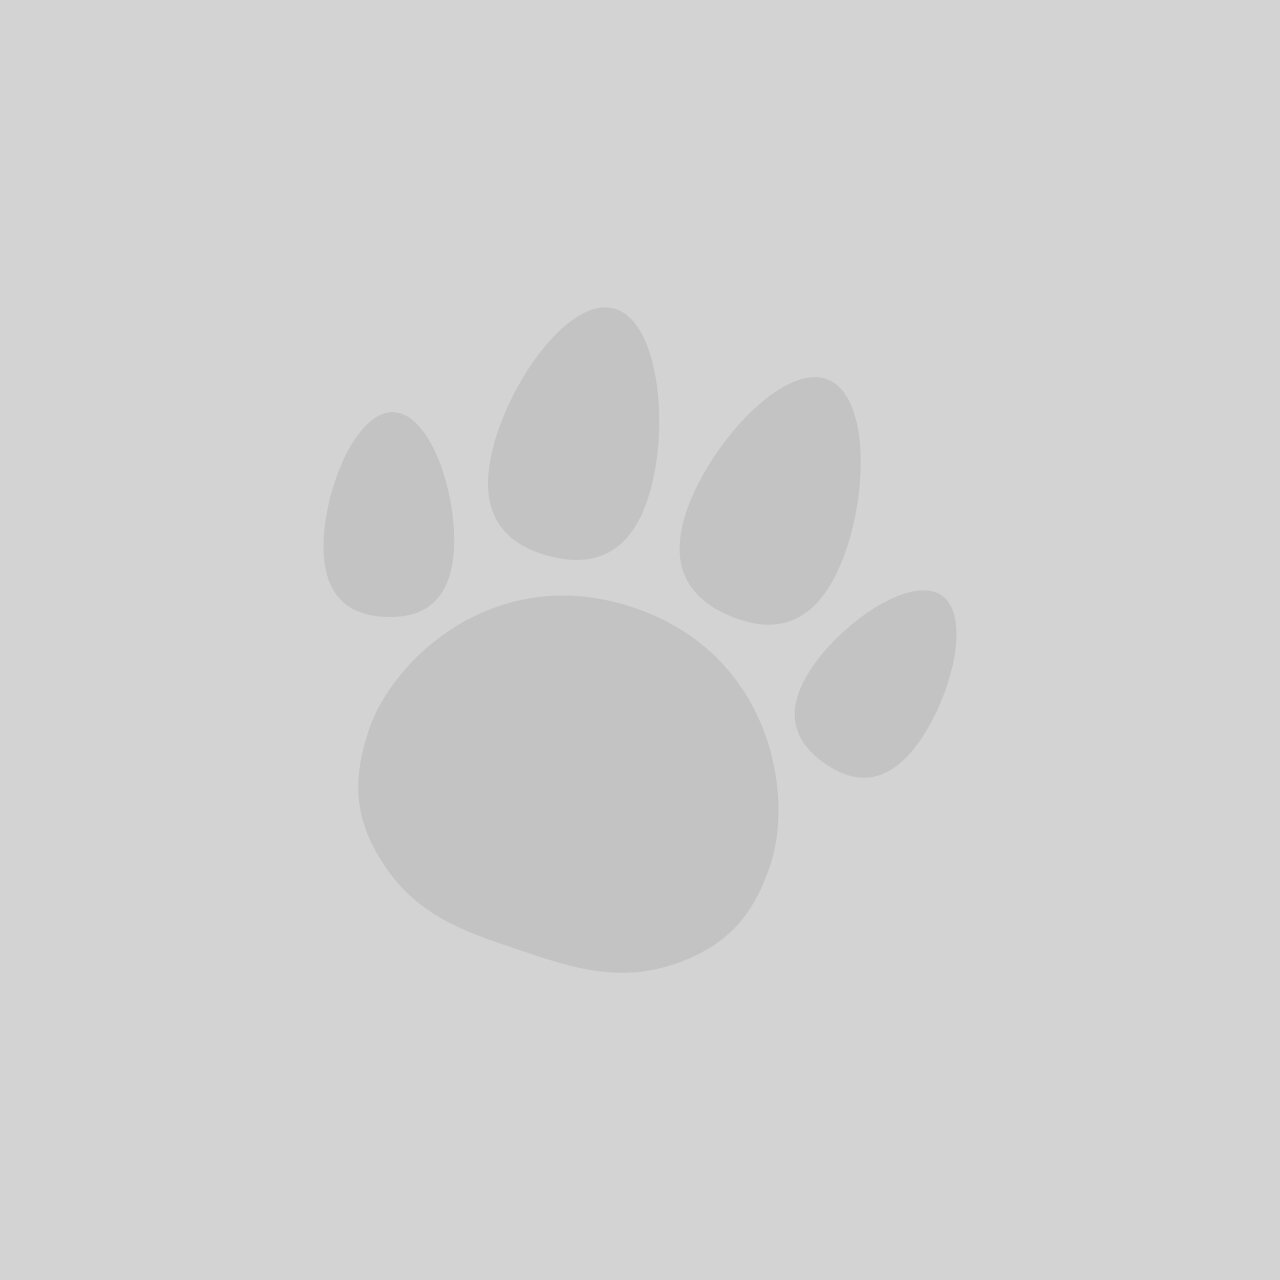 Webbox Cats Delight Tasty Sticks Salmon & Trout 6 Pack